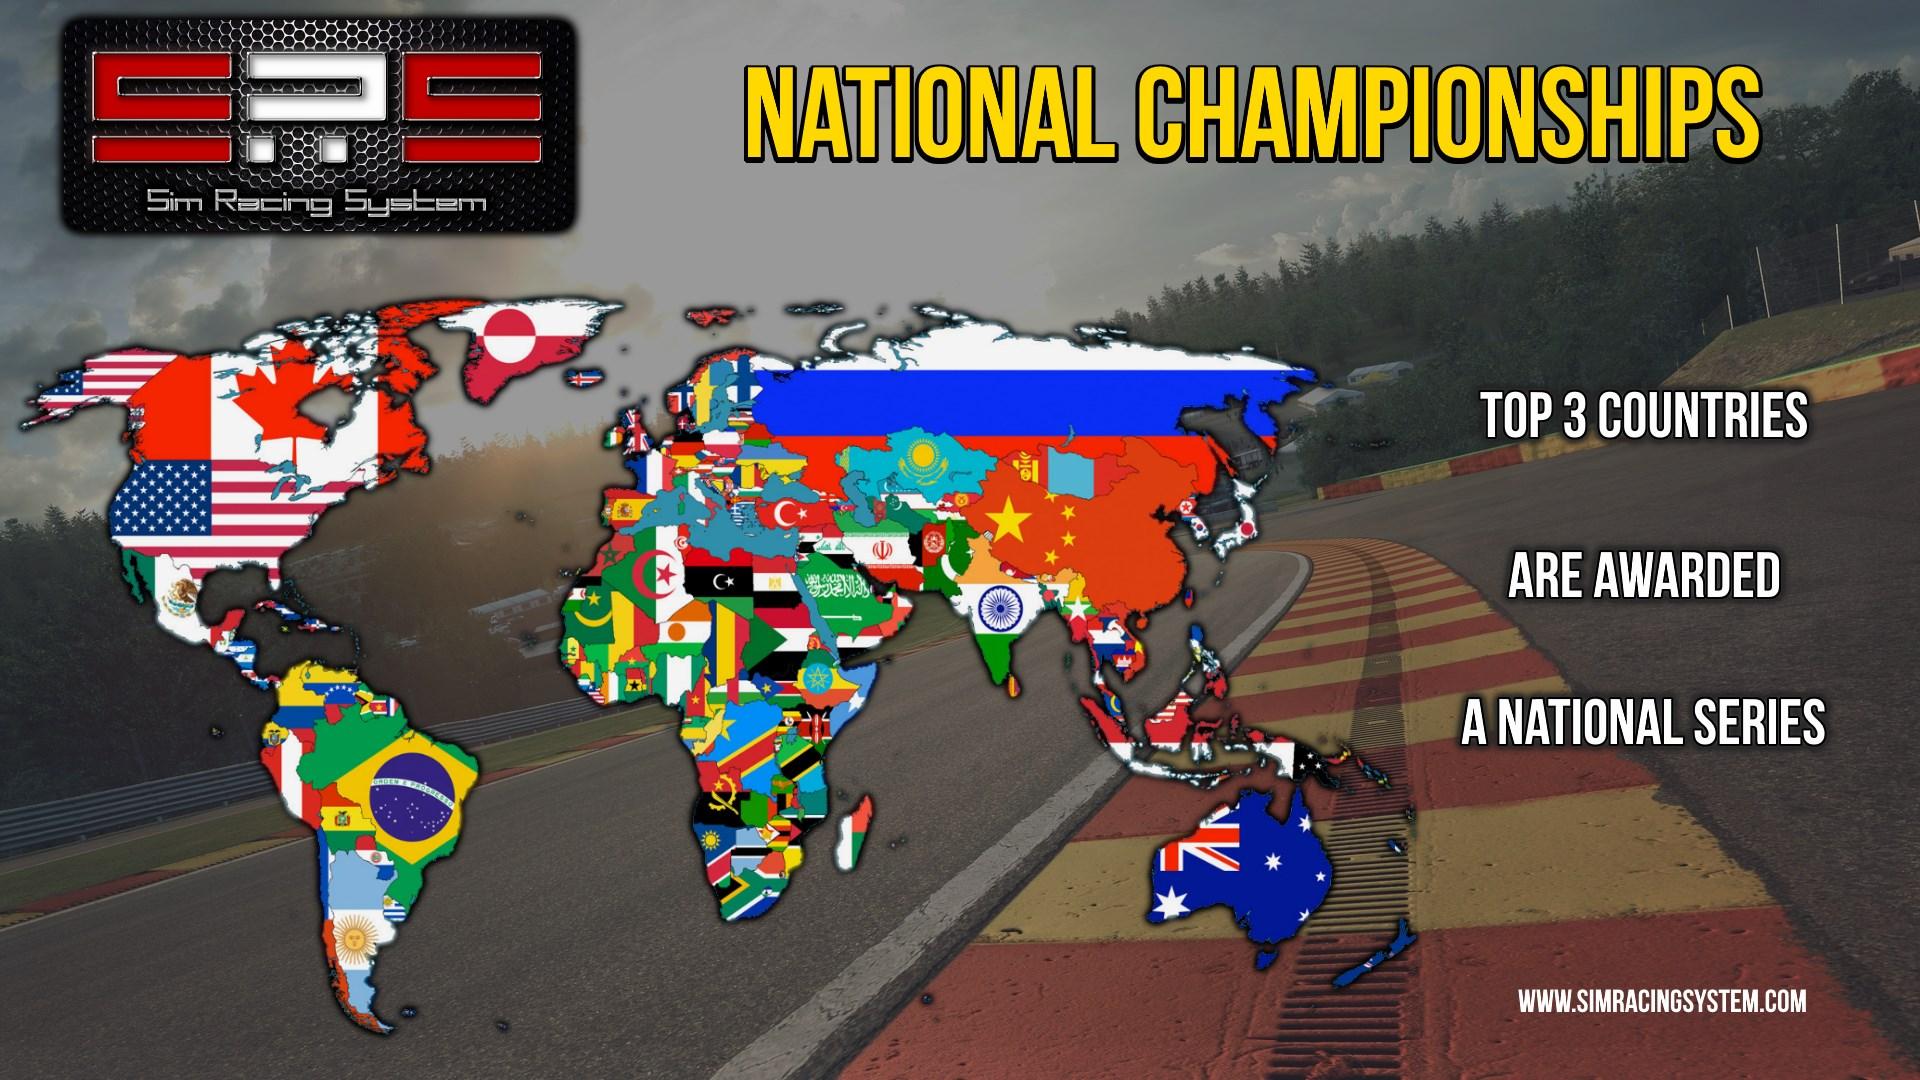 [Image: nationalchampionships.jpg]